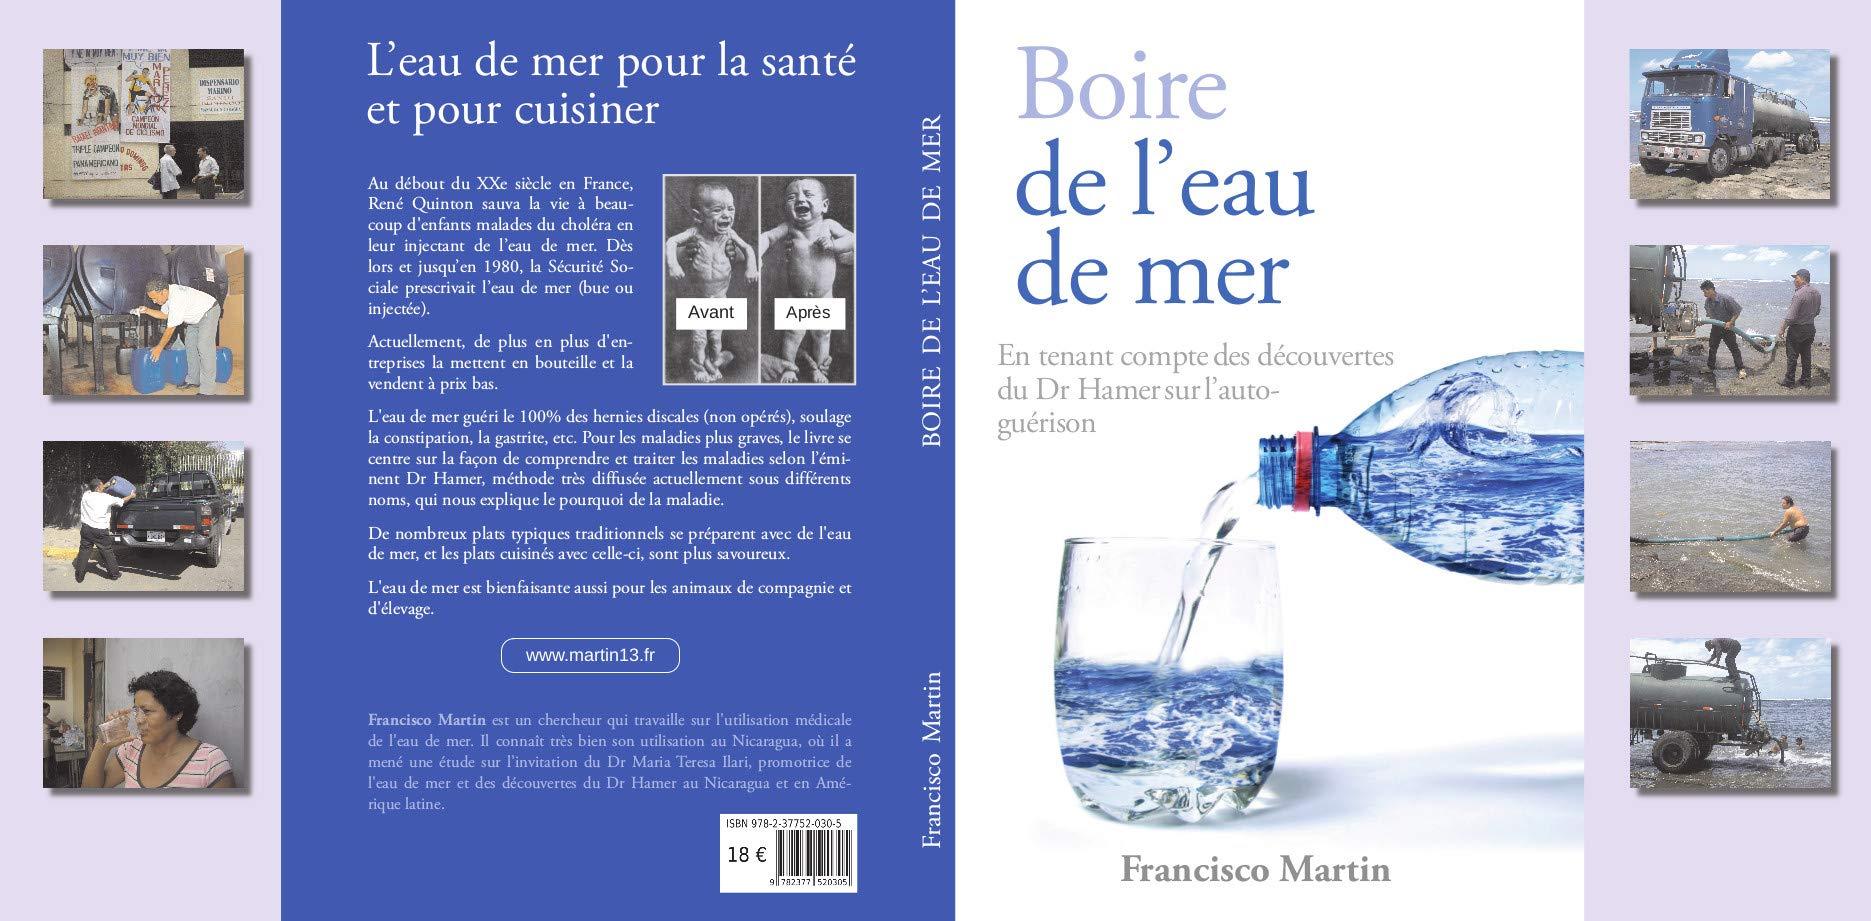 Boire de leau de mer : En tenant compte des découvertes du Dr Hamer sur lauto-guérison: Amazon.es: Martin, Francisco: Libros en idiomas extranjeros